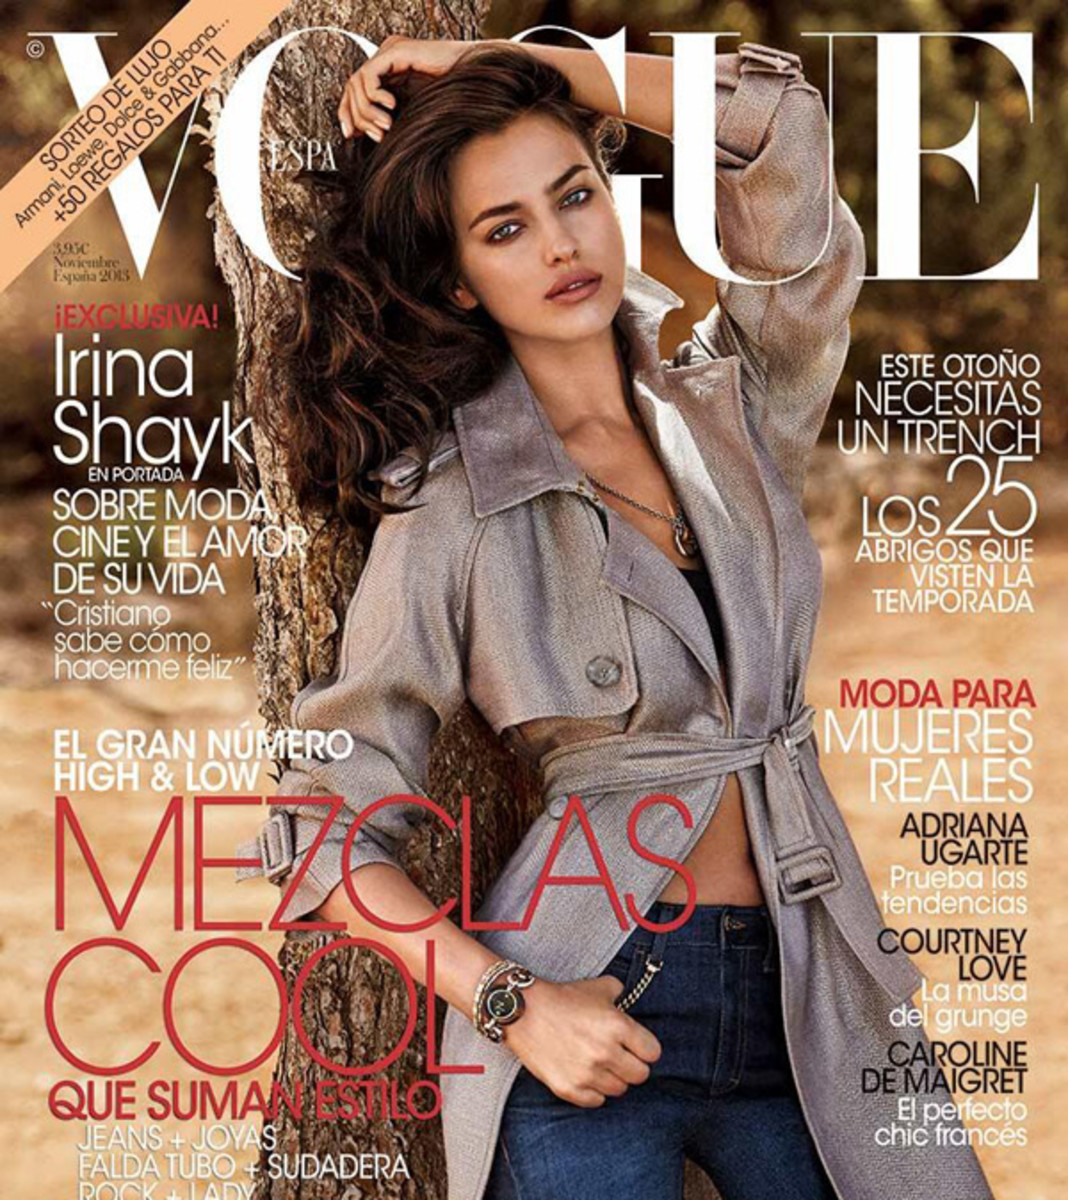 Irina Shayk :: Courtesy of Vogue Spain